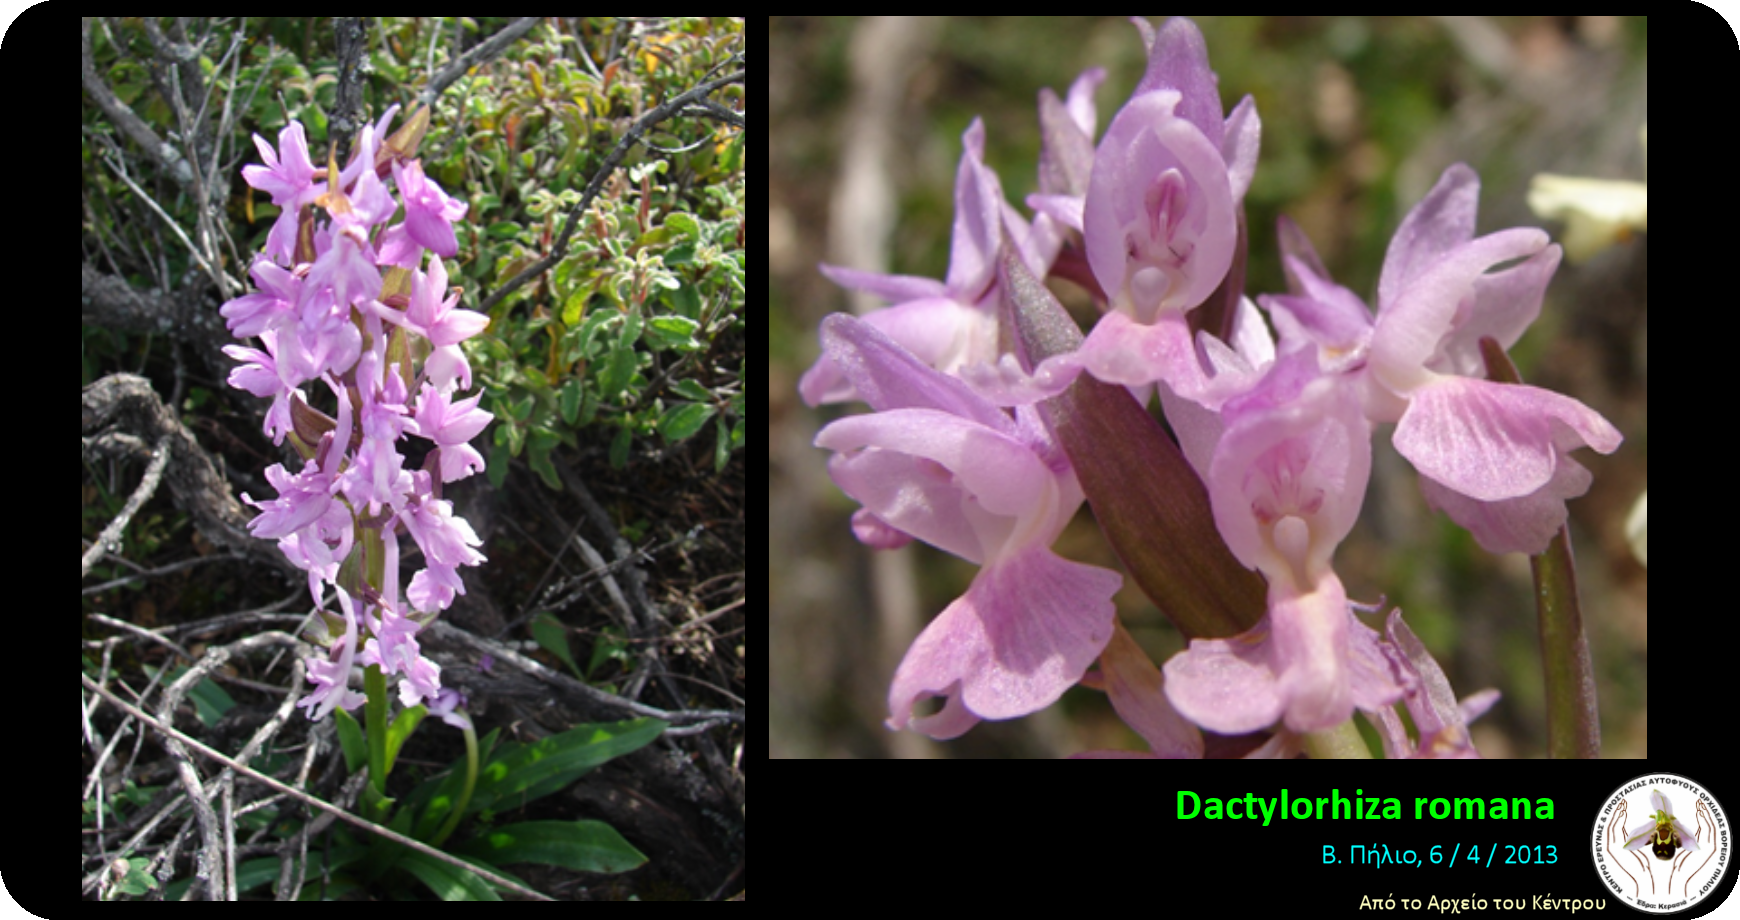 Dactylorhiza romana.png